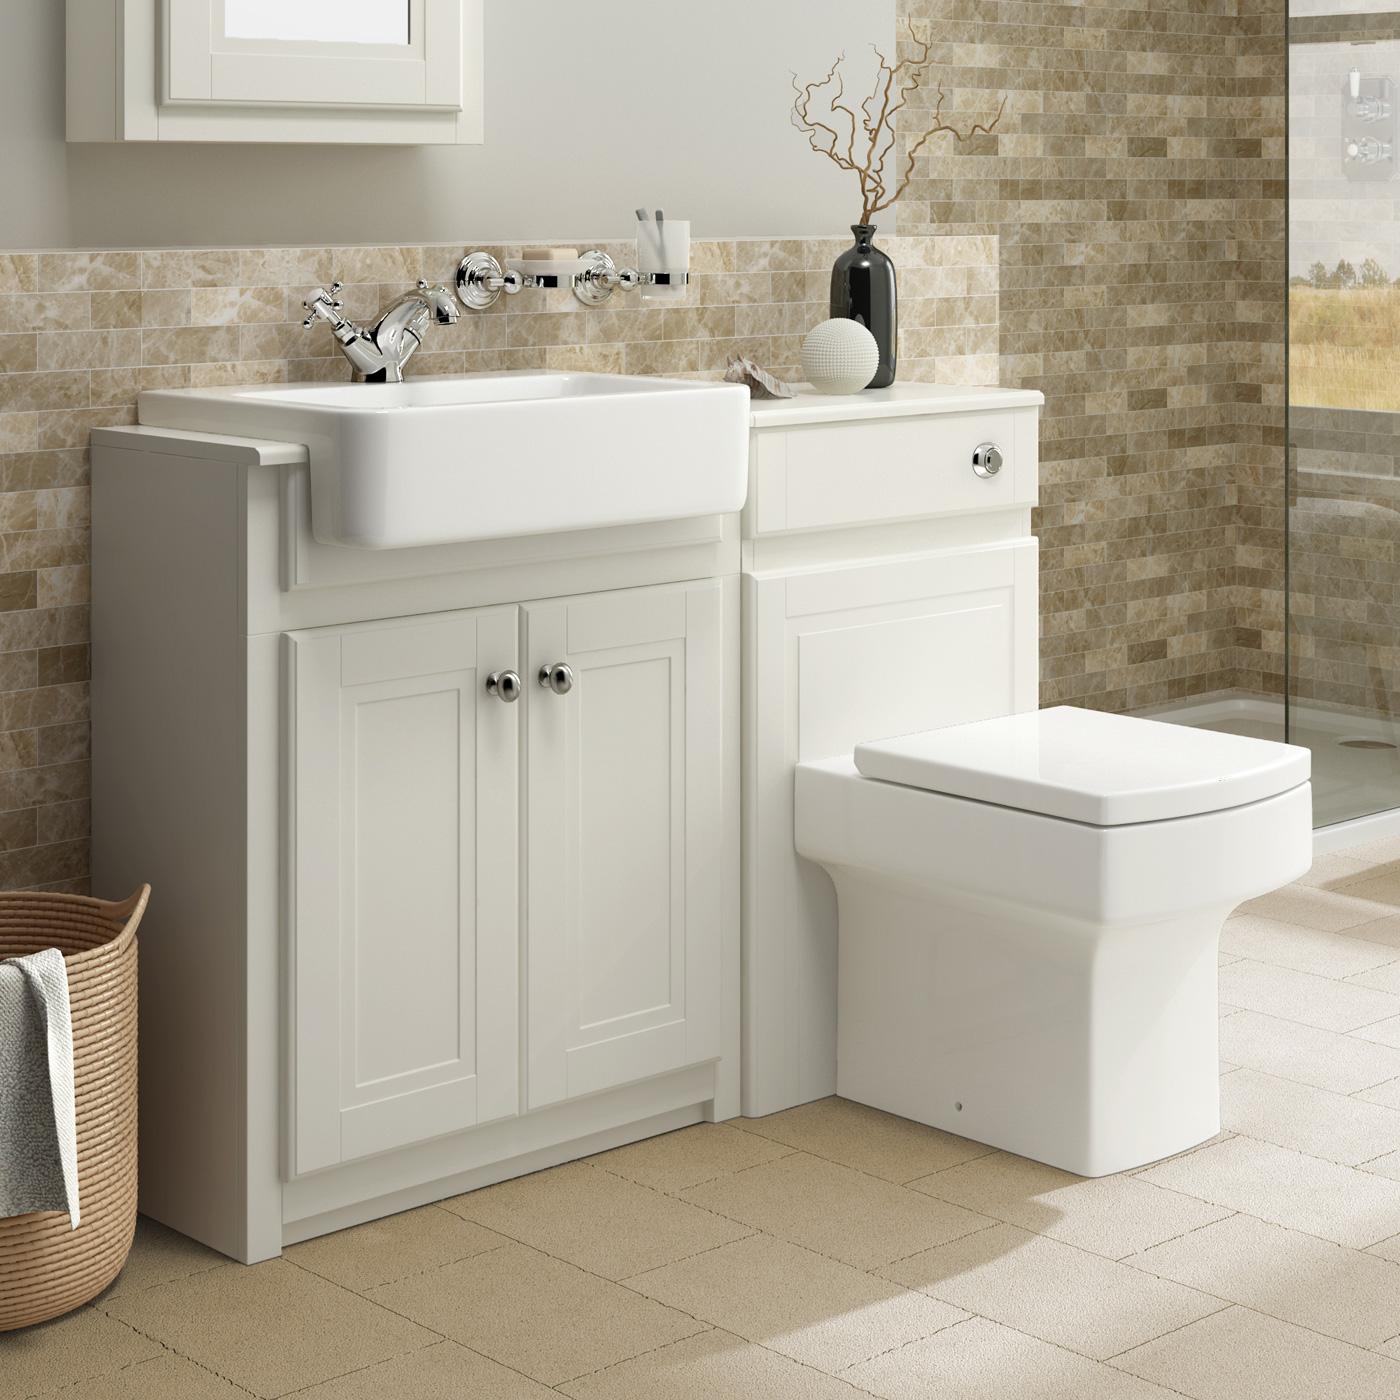 Bathroom vanity units Traditional vanity unit Washbasin Washbasin Wall-mounted toilet LSKTDOJ